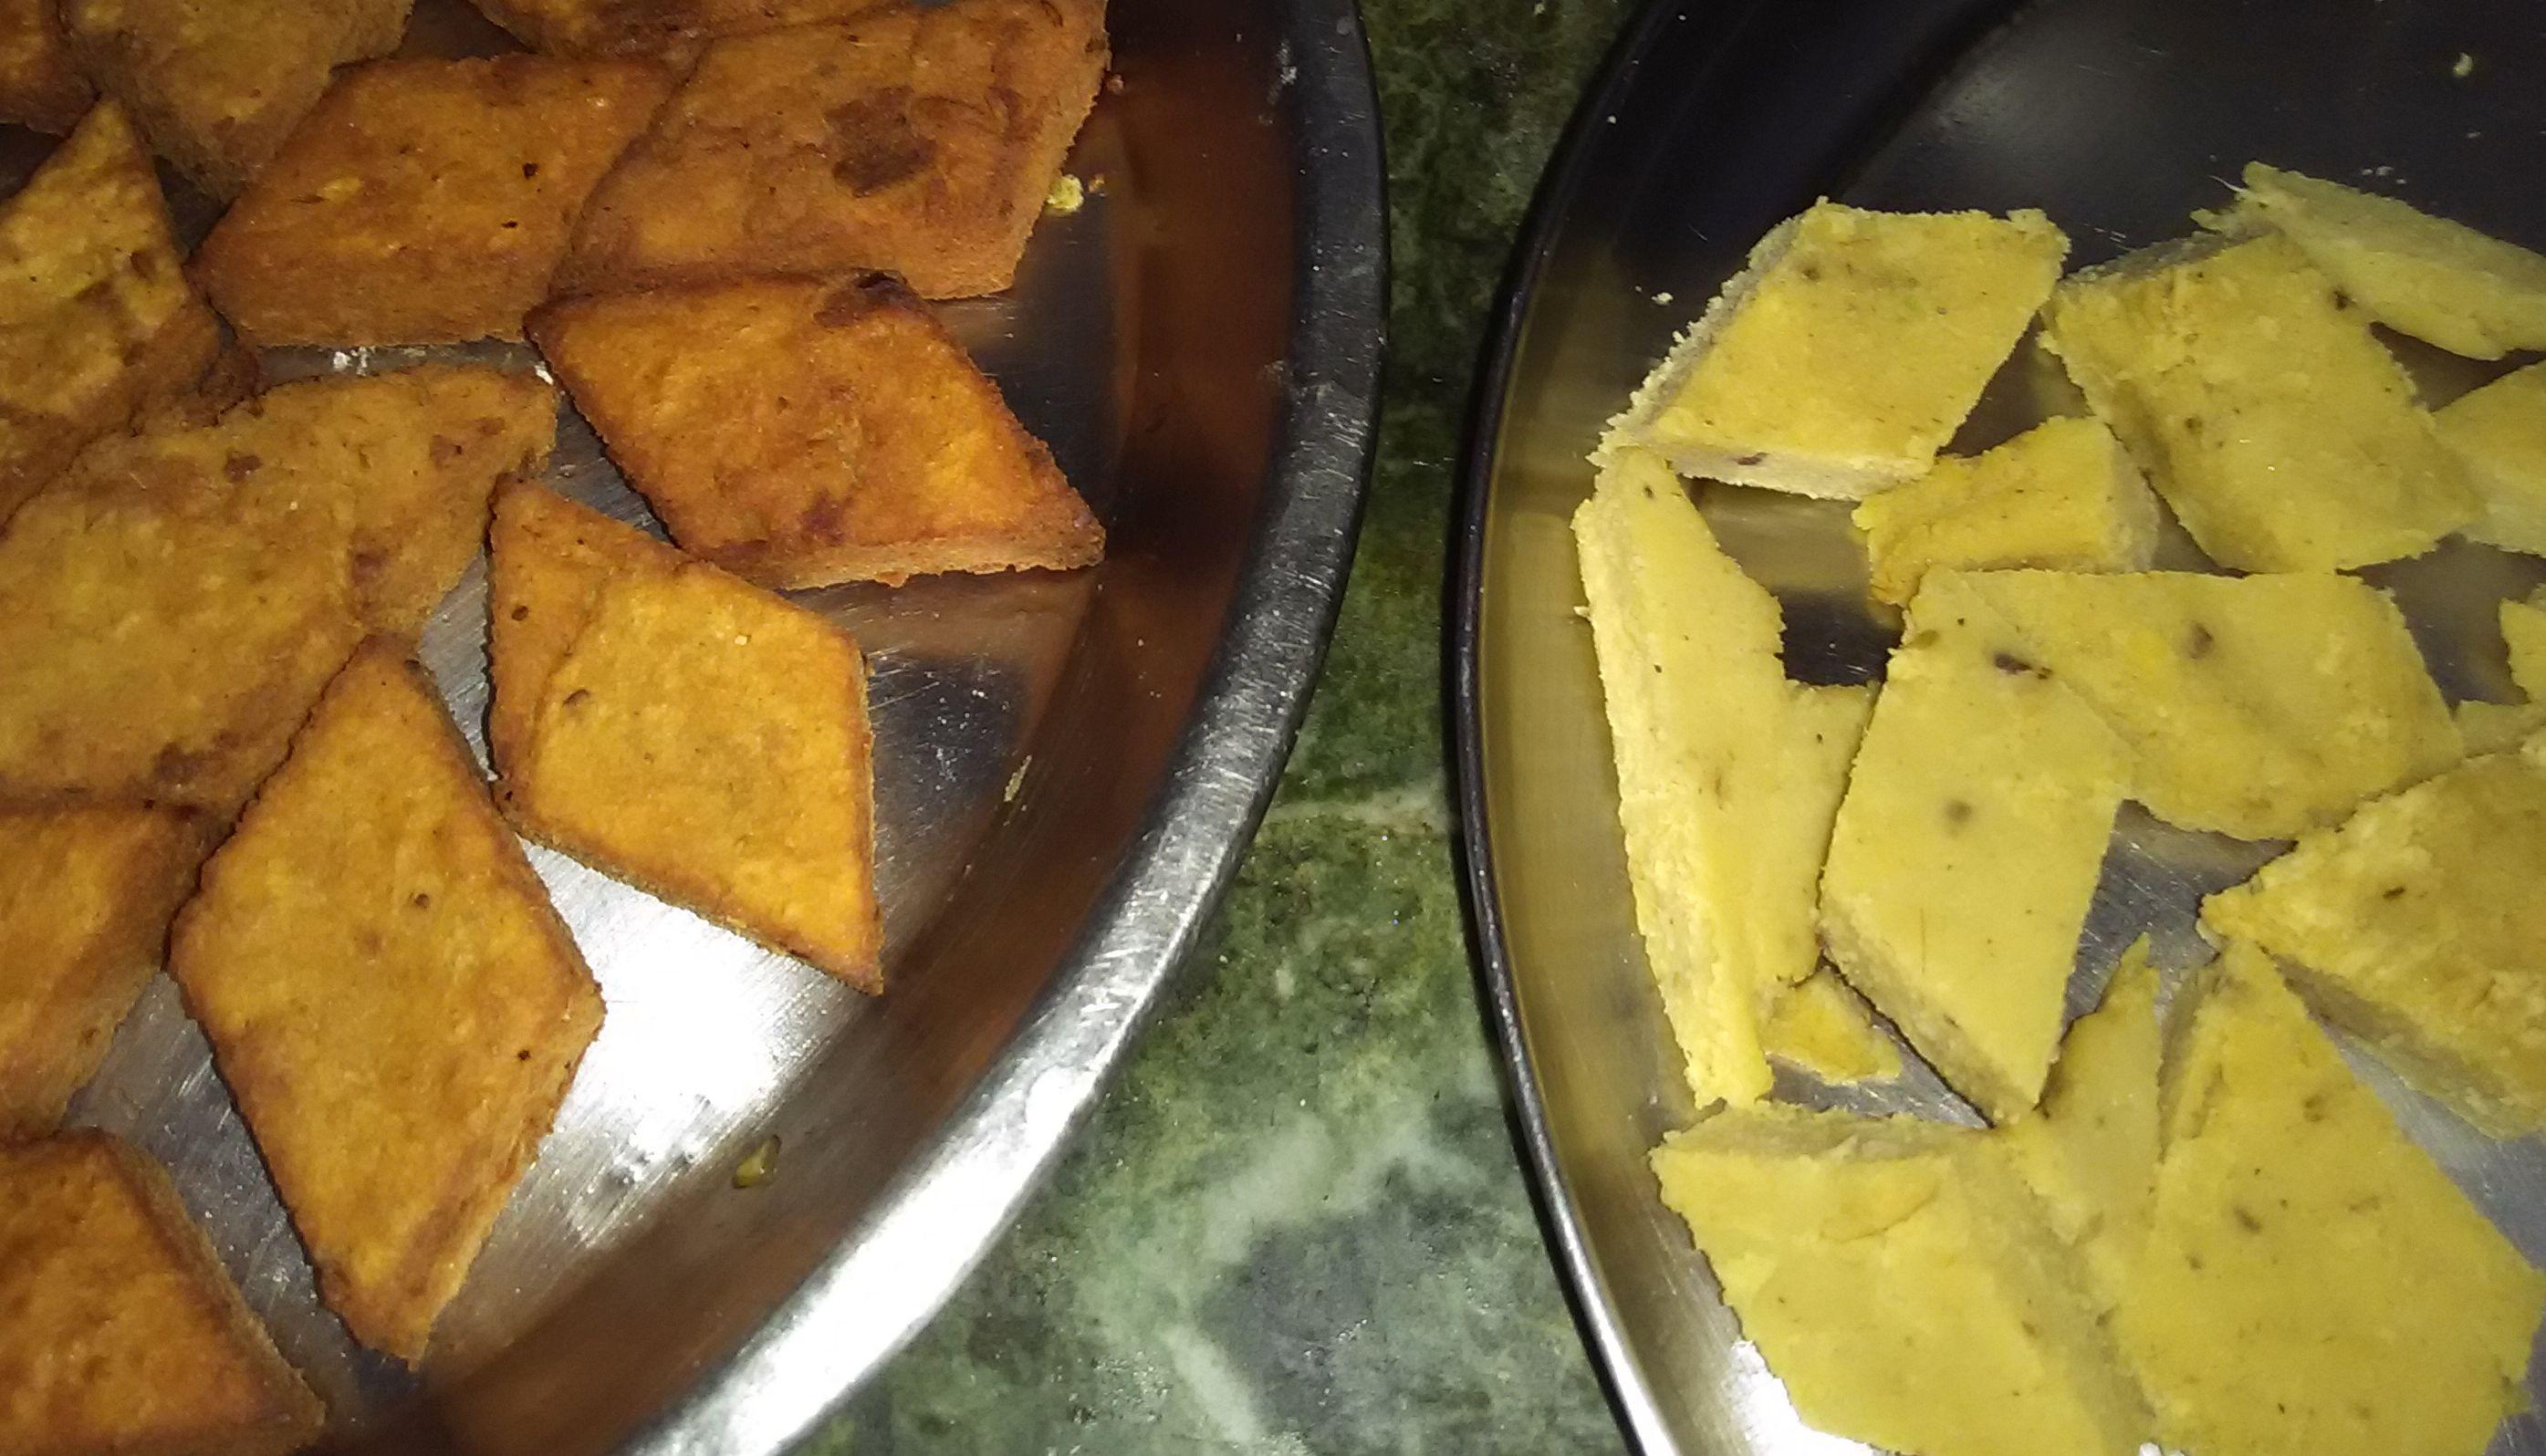 File:Fried cake of Bengal gram(Bengali name Dhoka) jpg - Wikimedia